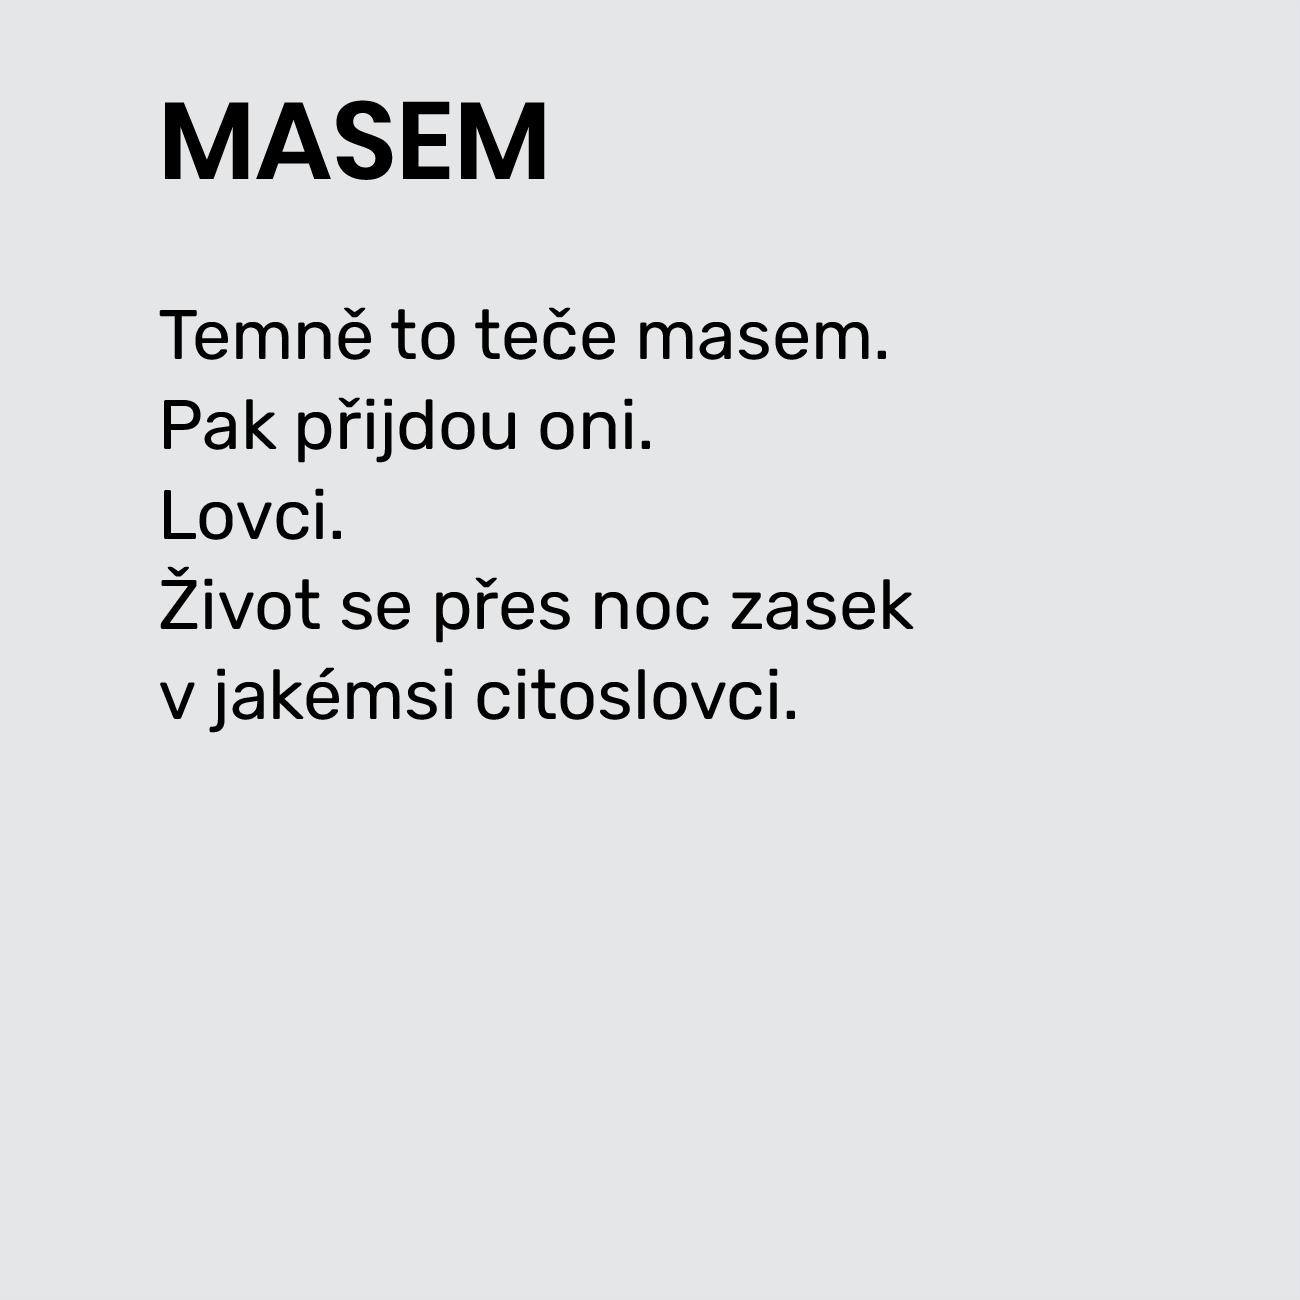 MASEM